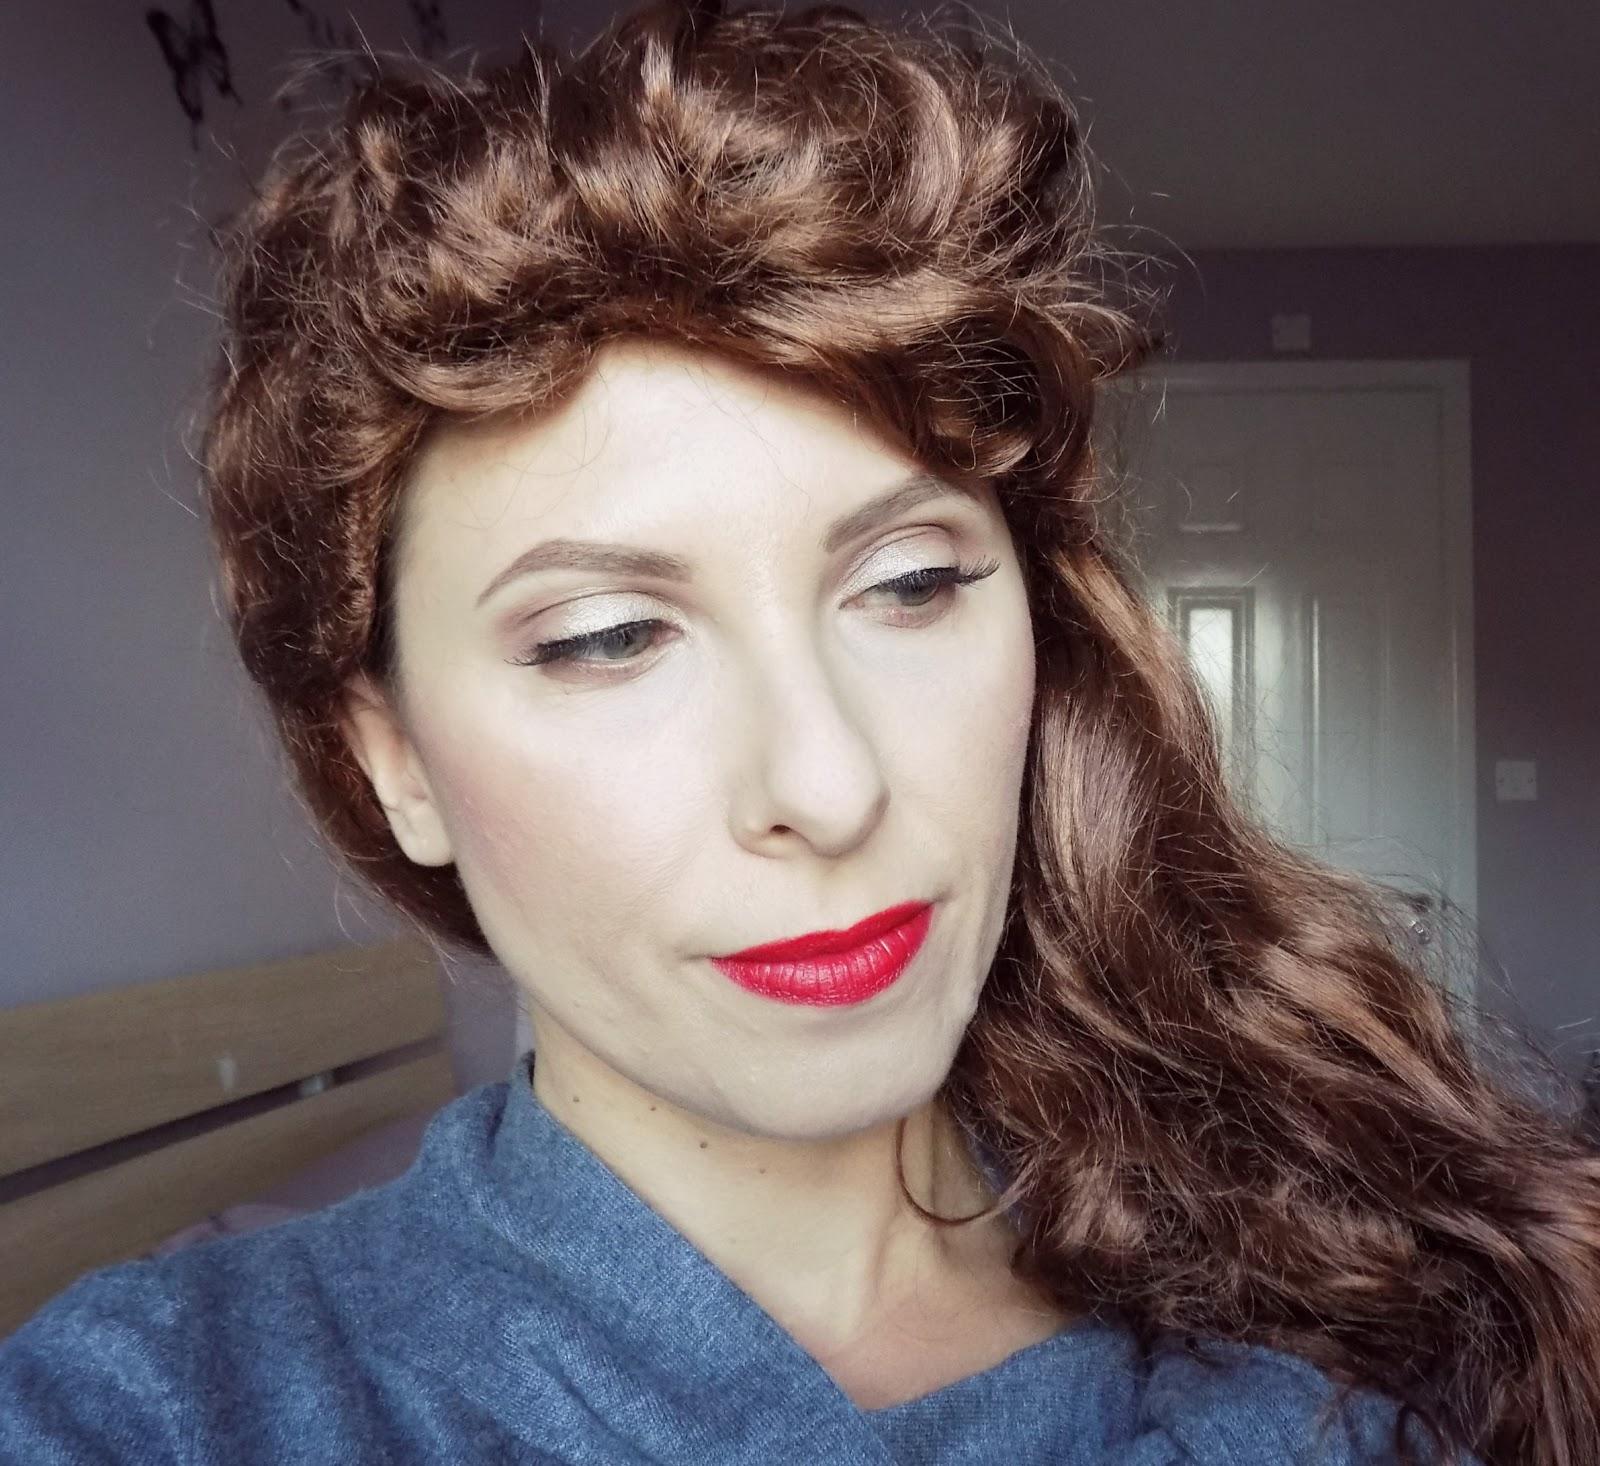 Makeup through the decades #3 1940s | Mummy's Beauty Corner